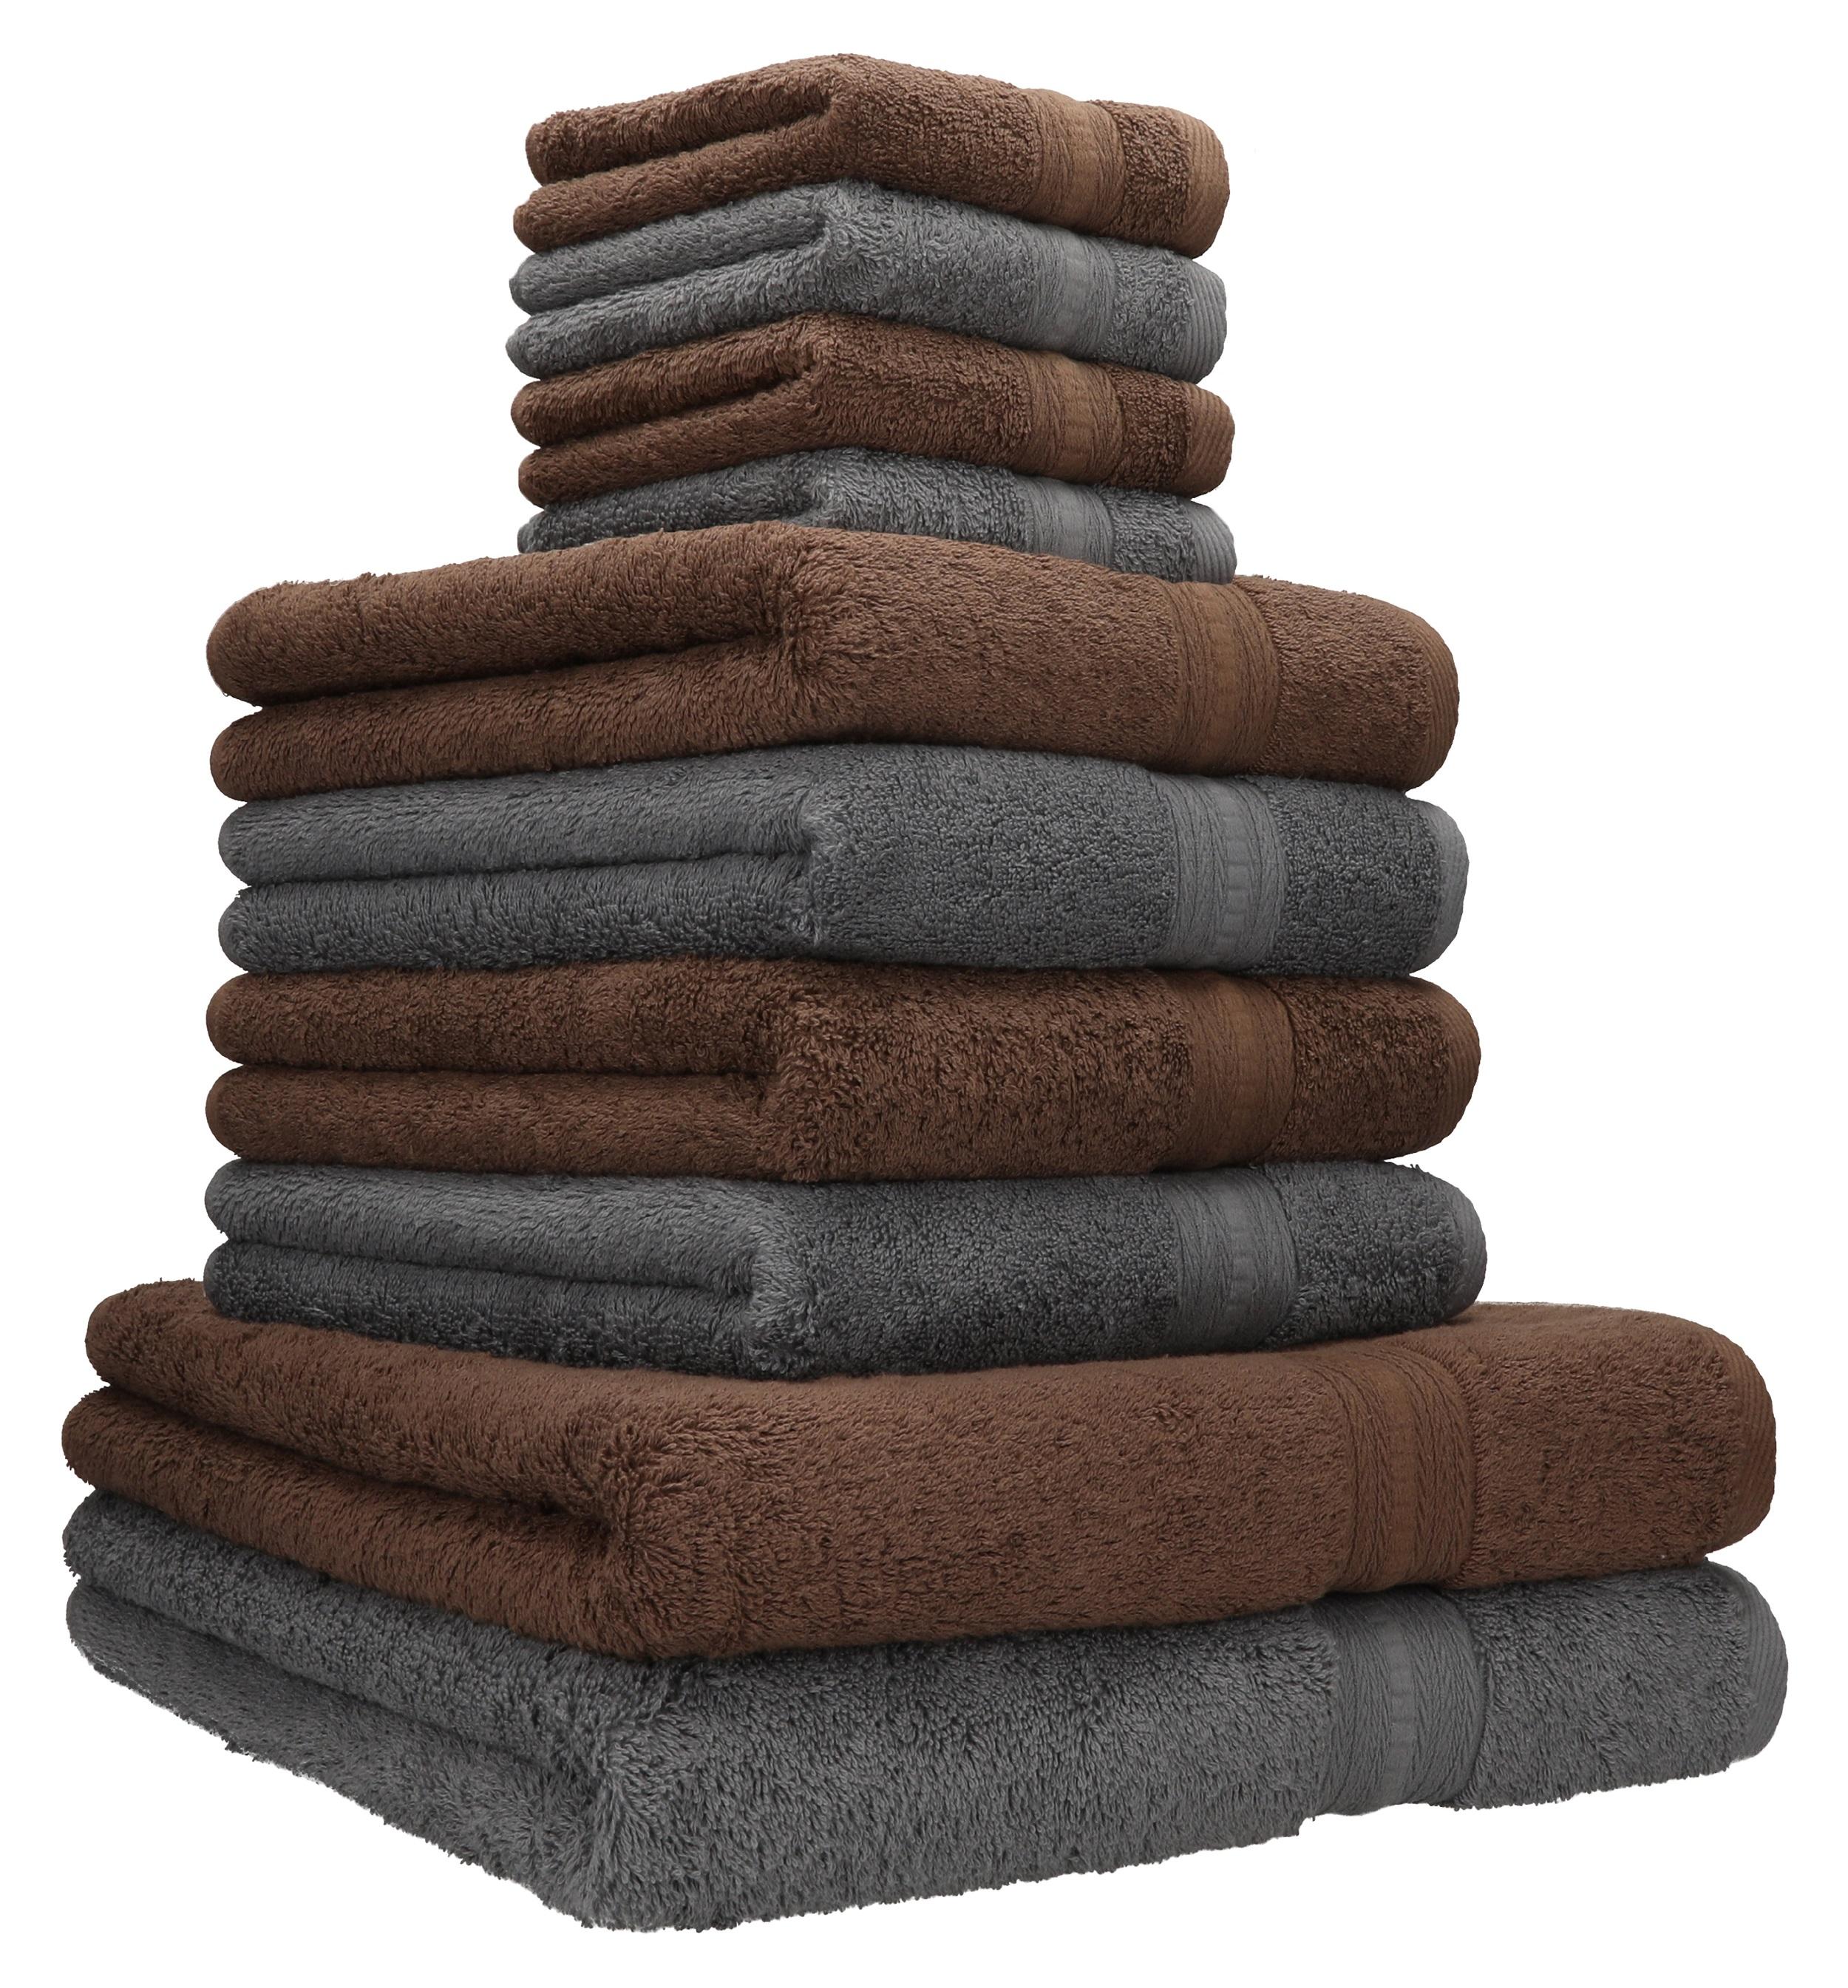 Handtuch Set 2er 4er 8er 10er 100/% Baumwolle Duschtuch Gästetuch Frottee Fußtuch